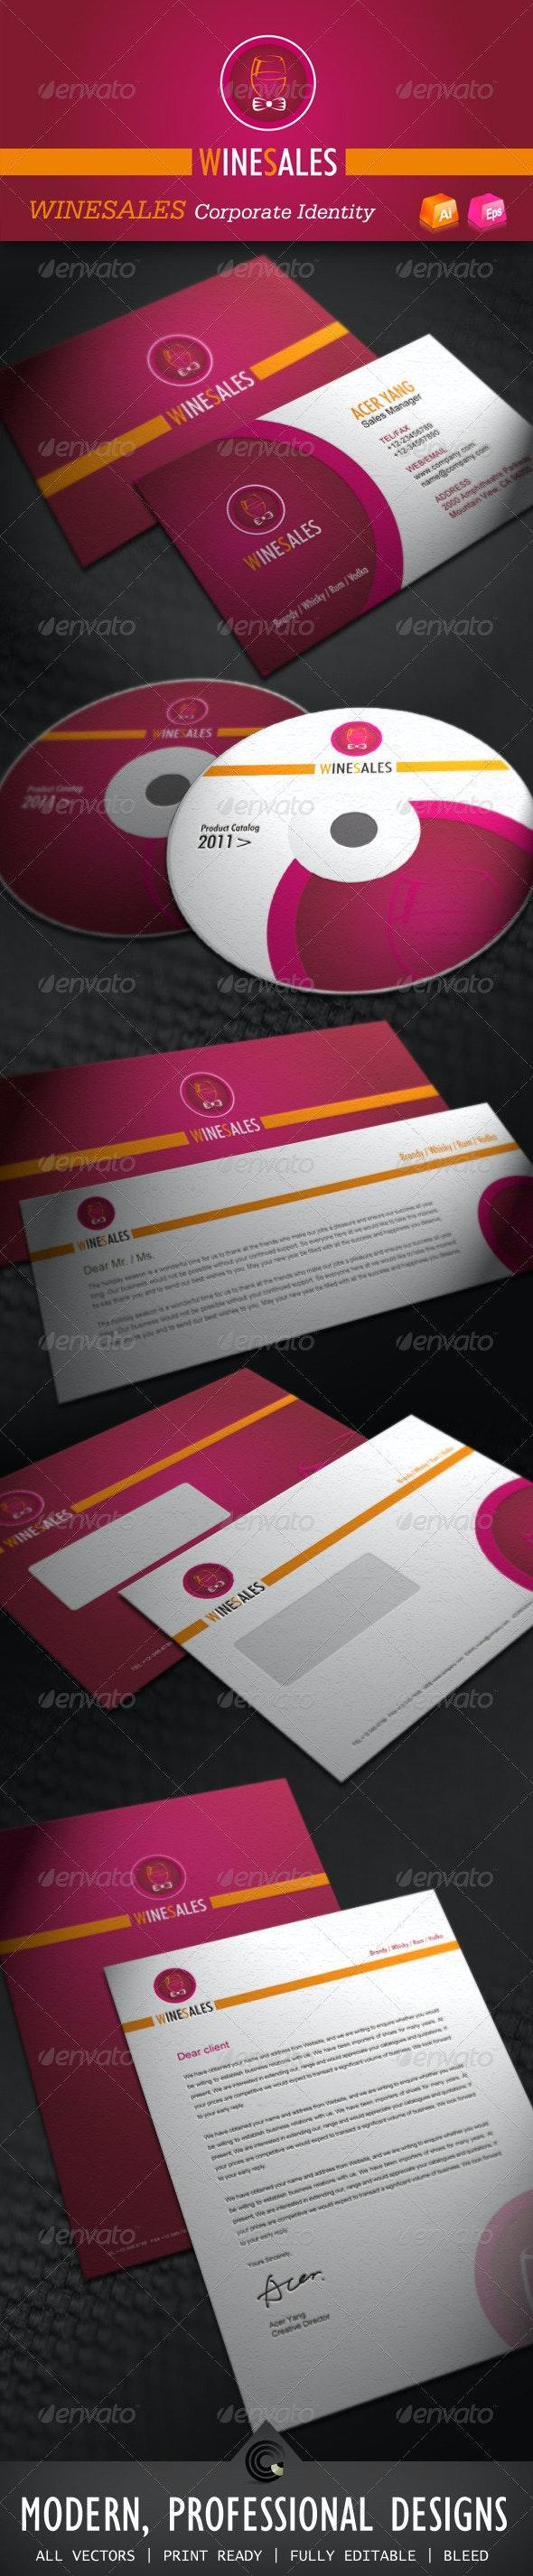 Wine Sales Corporate Identity - Stationery Print Templates